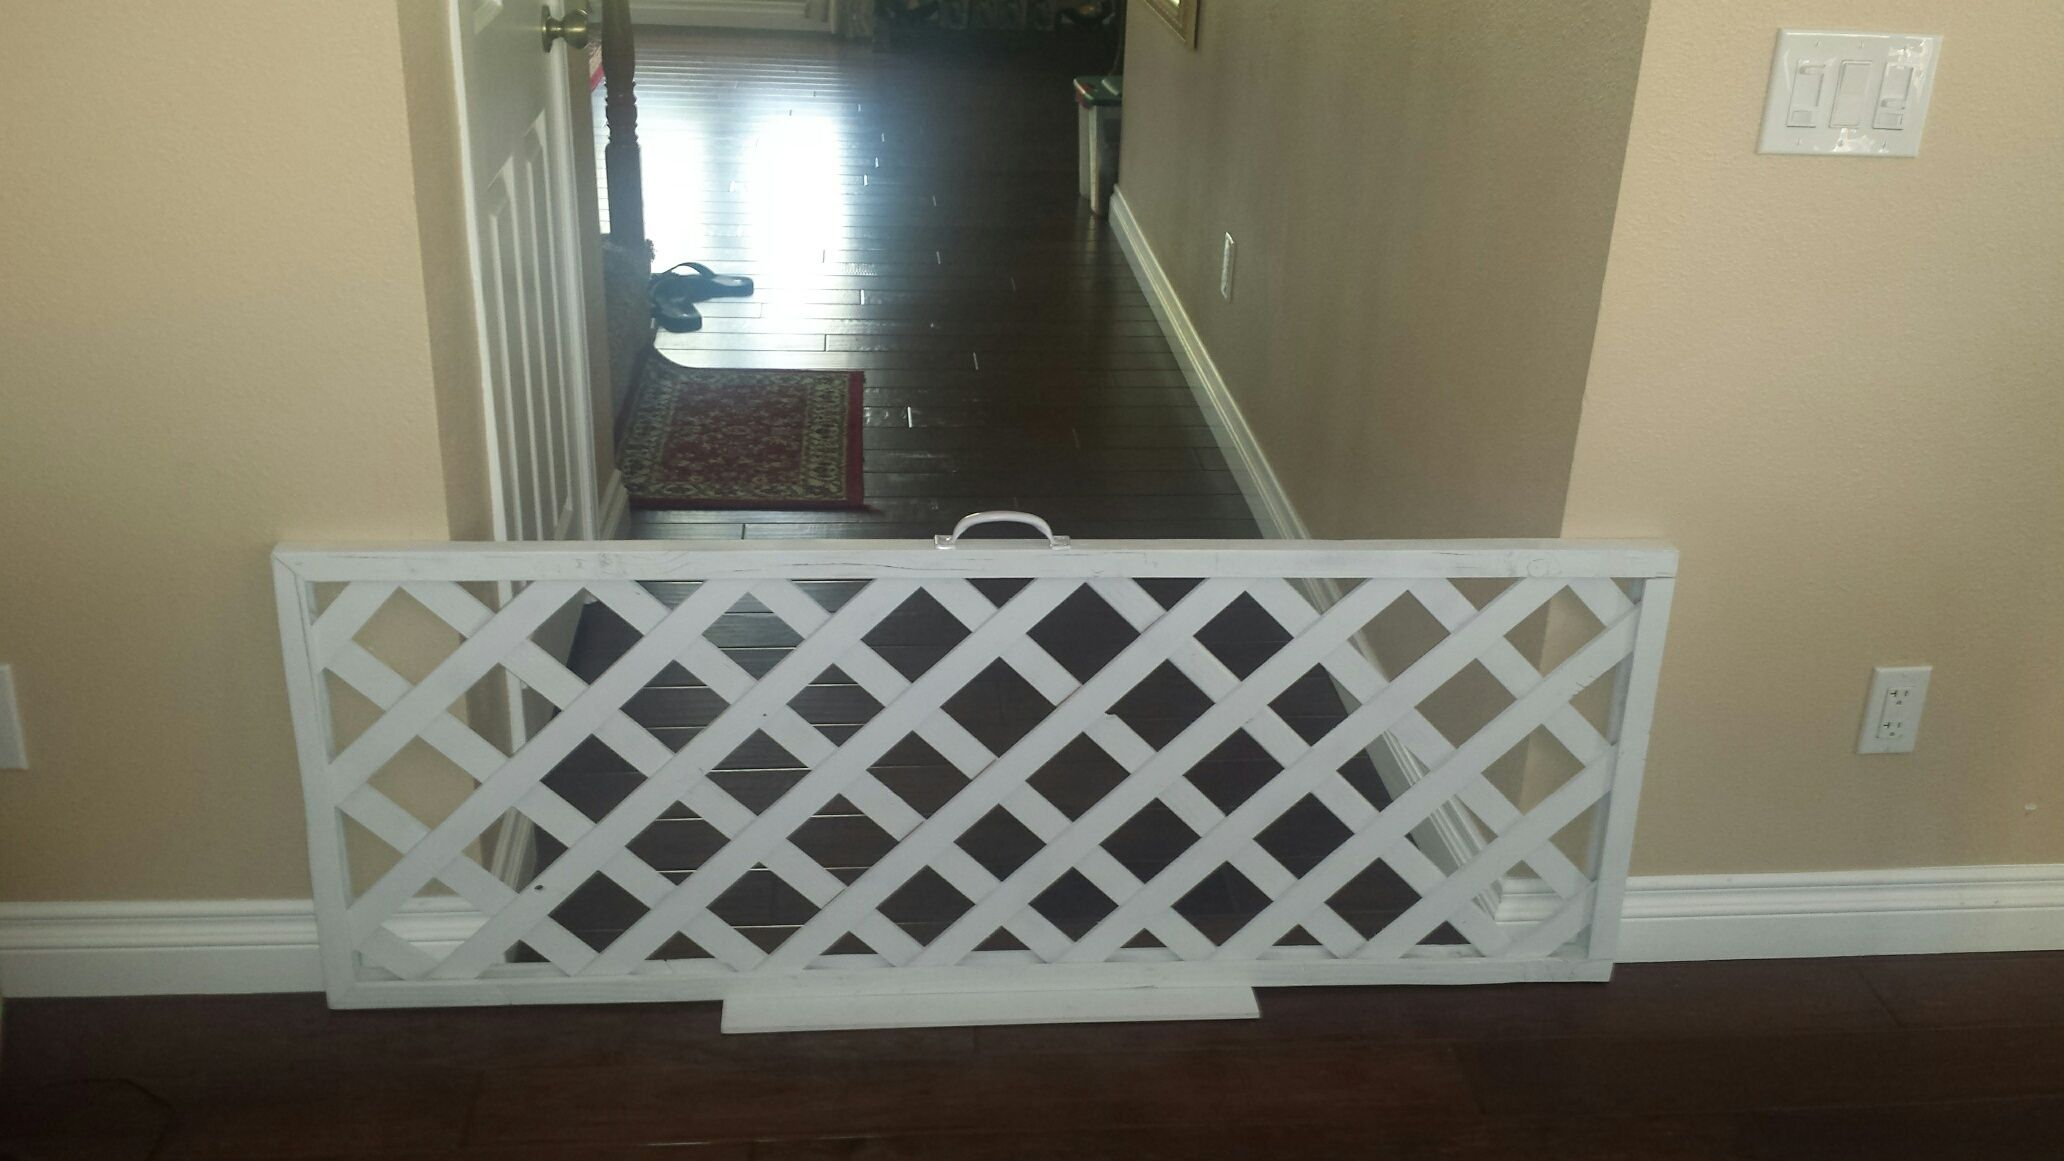 Inexpensive Indoor Dog Barrier Fence For Wider Hallways